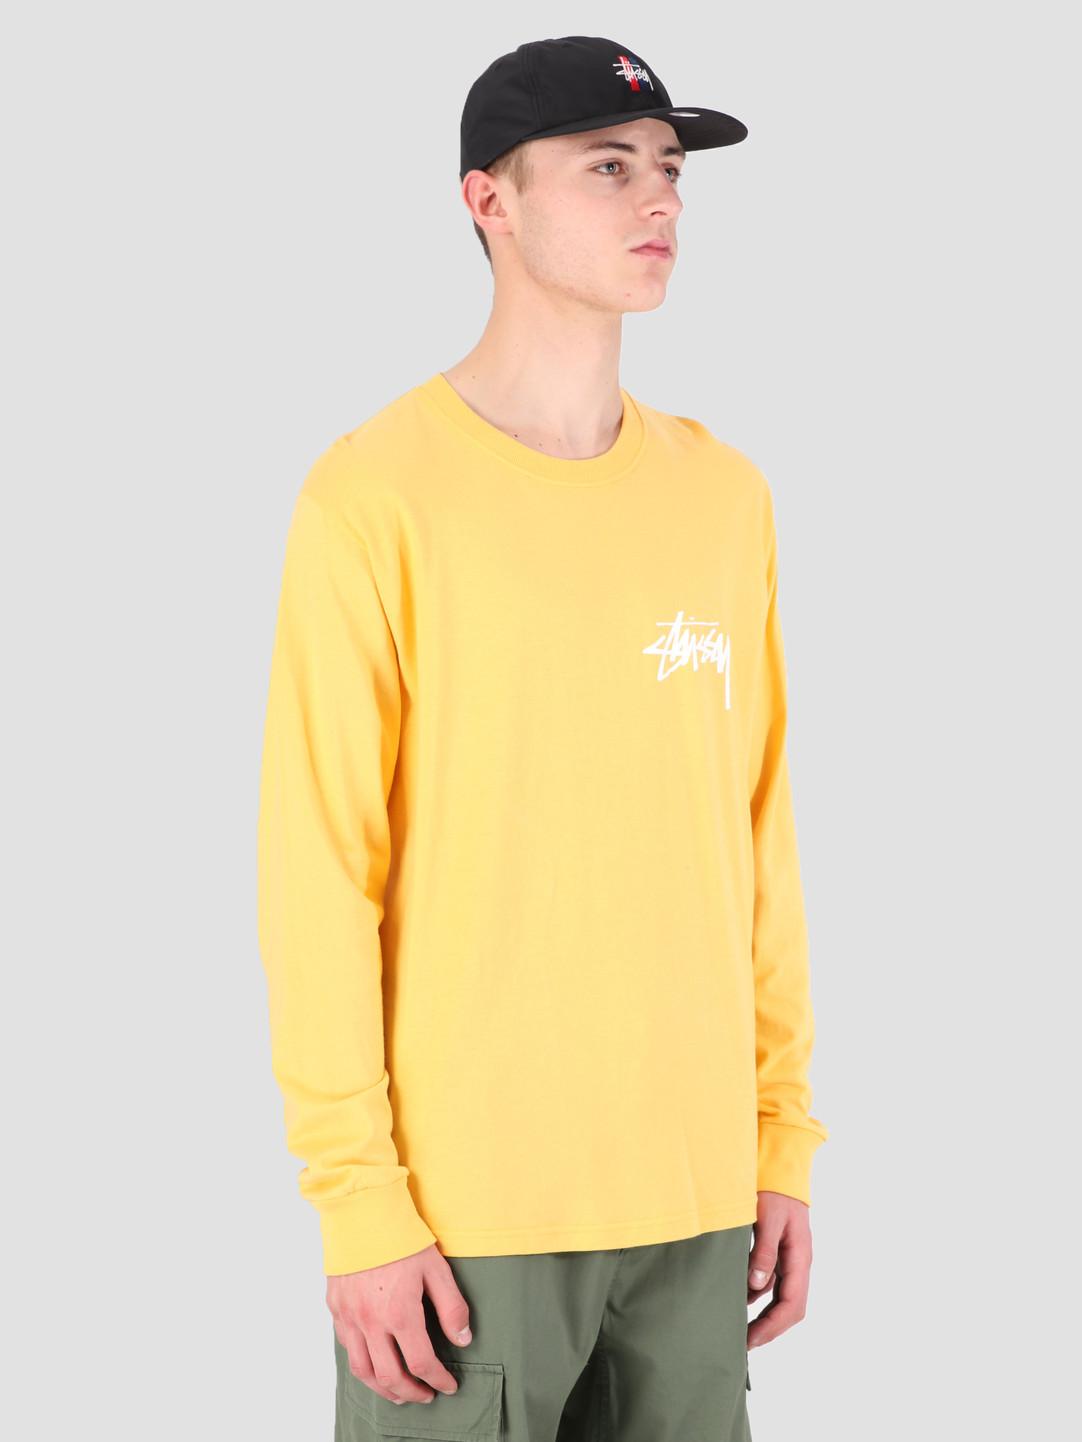 Stussy Stussy Stock Longsleeve T-Shirt Orange 0602